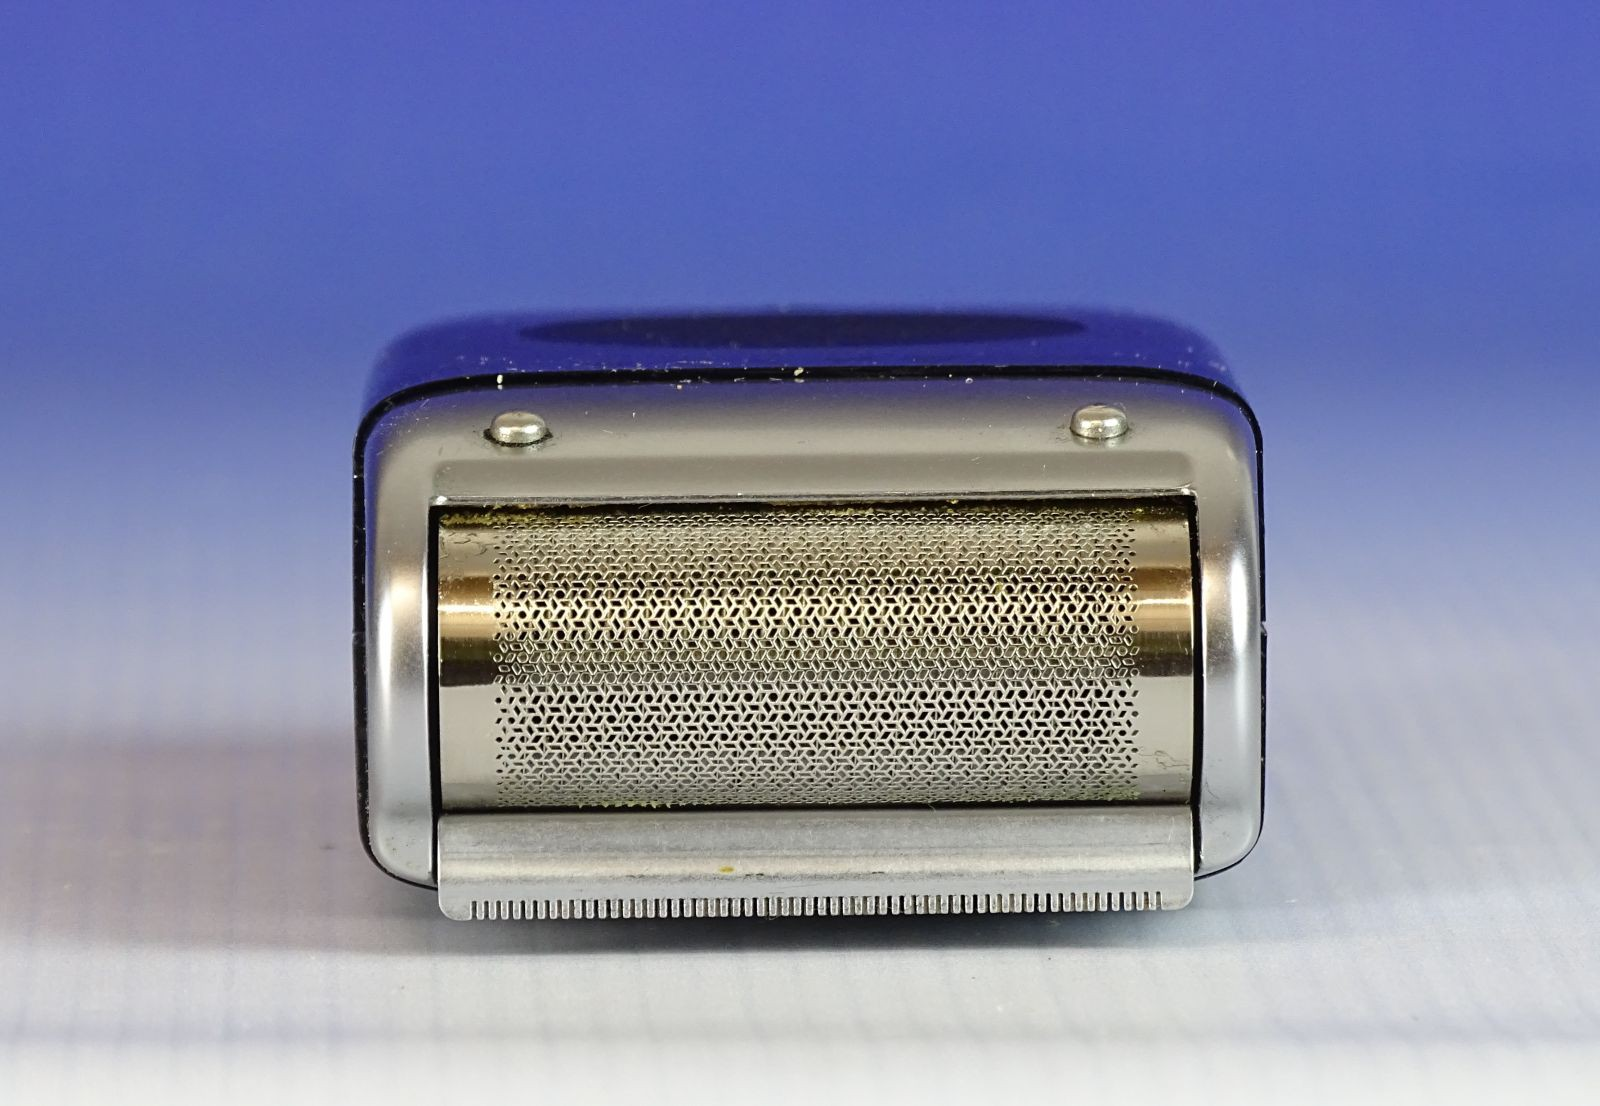 DSC05262.JPG (1600×1106)